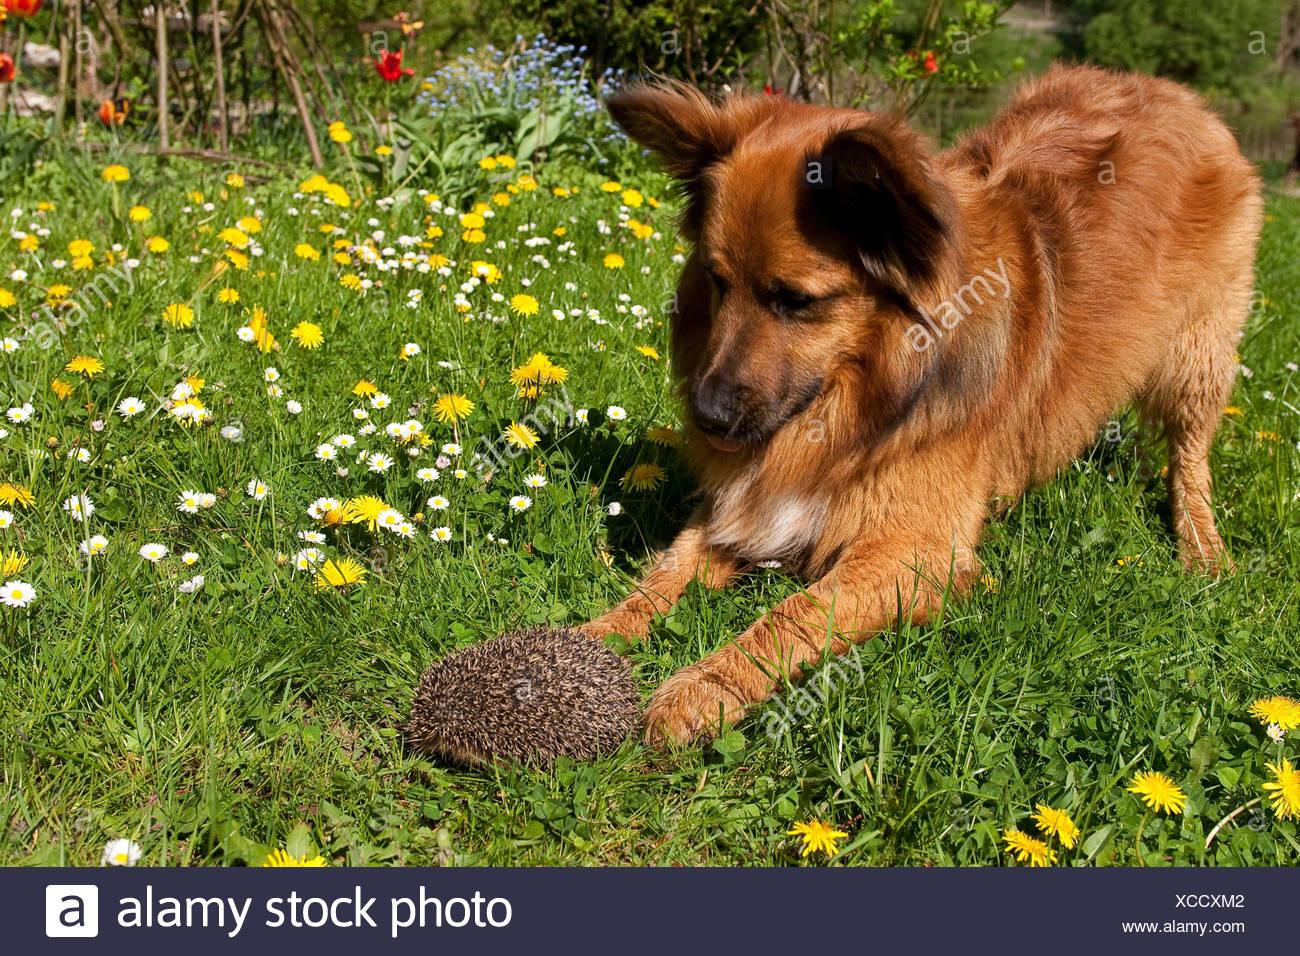 Western hedgehog, European hedgehog (Erinaceus europaeus), dog and hedgehog meeting in a meadow, Germany Stock Photo